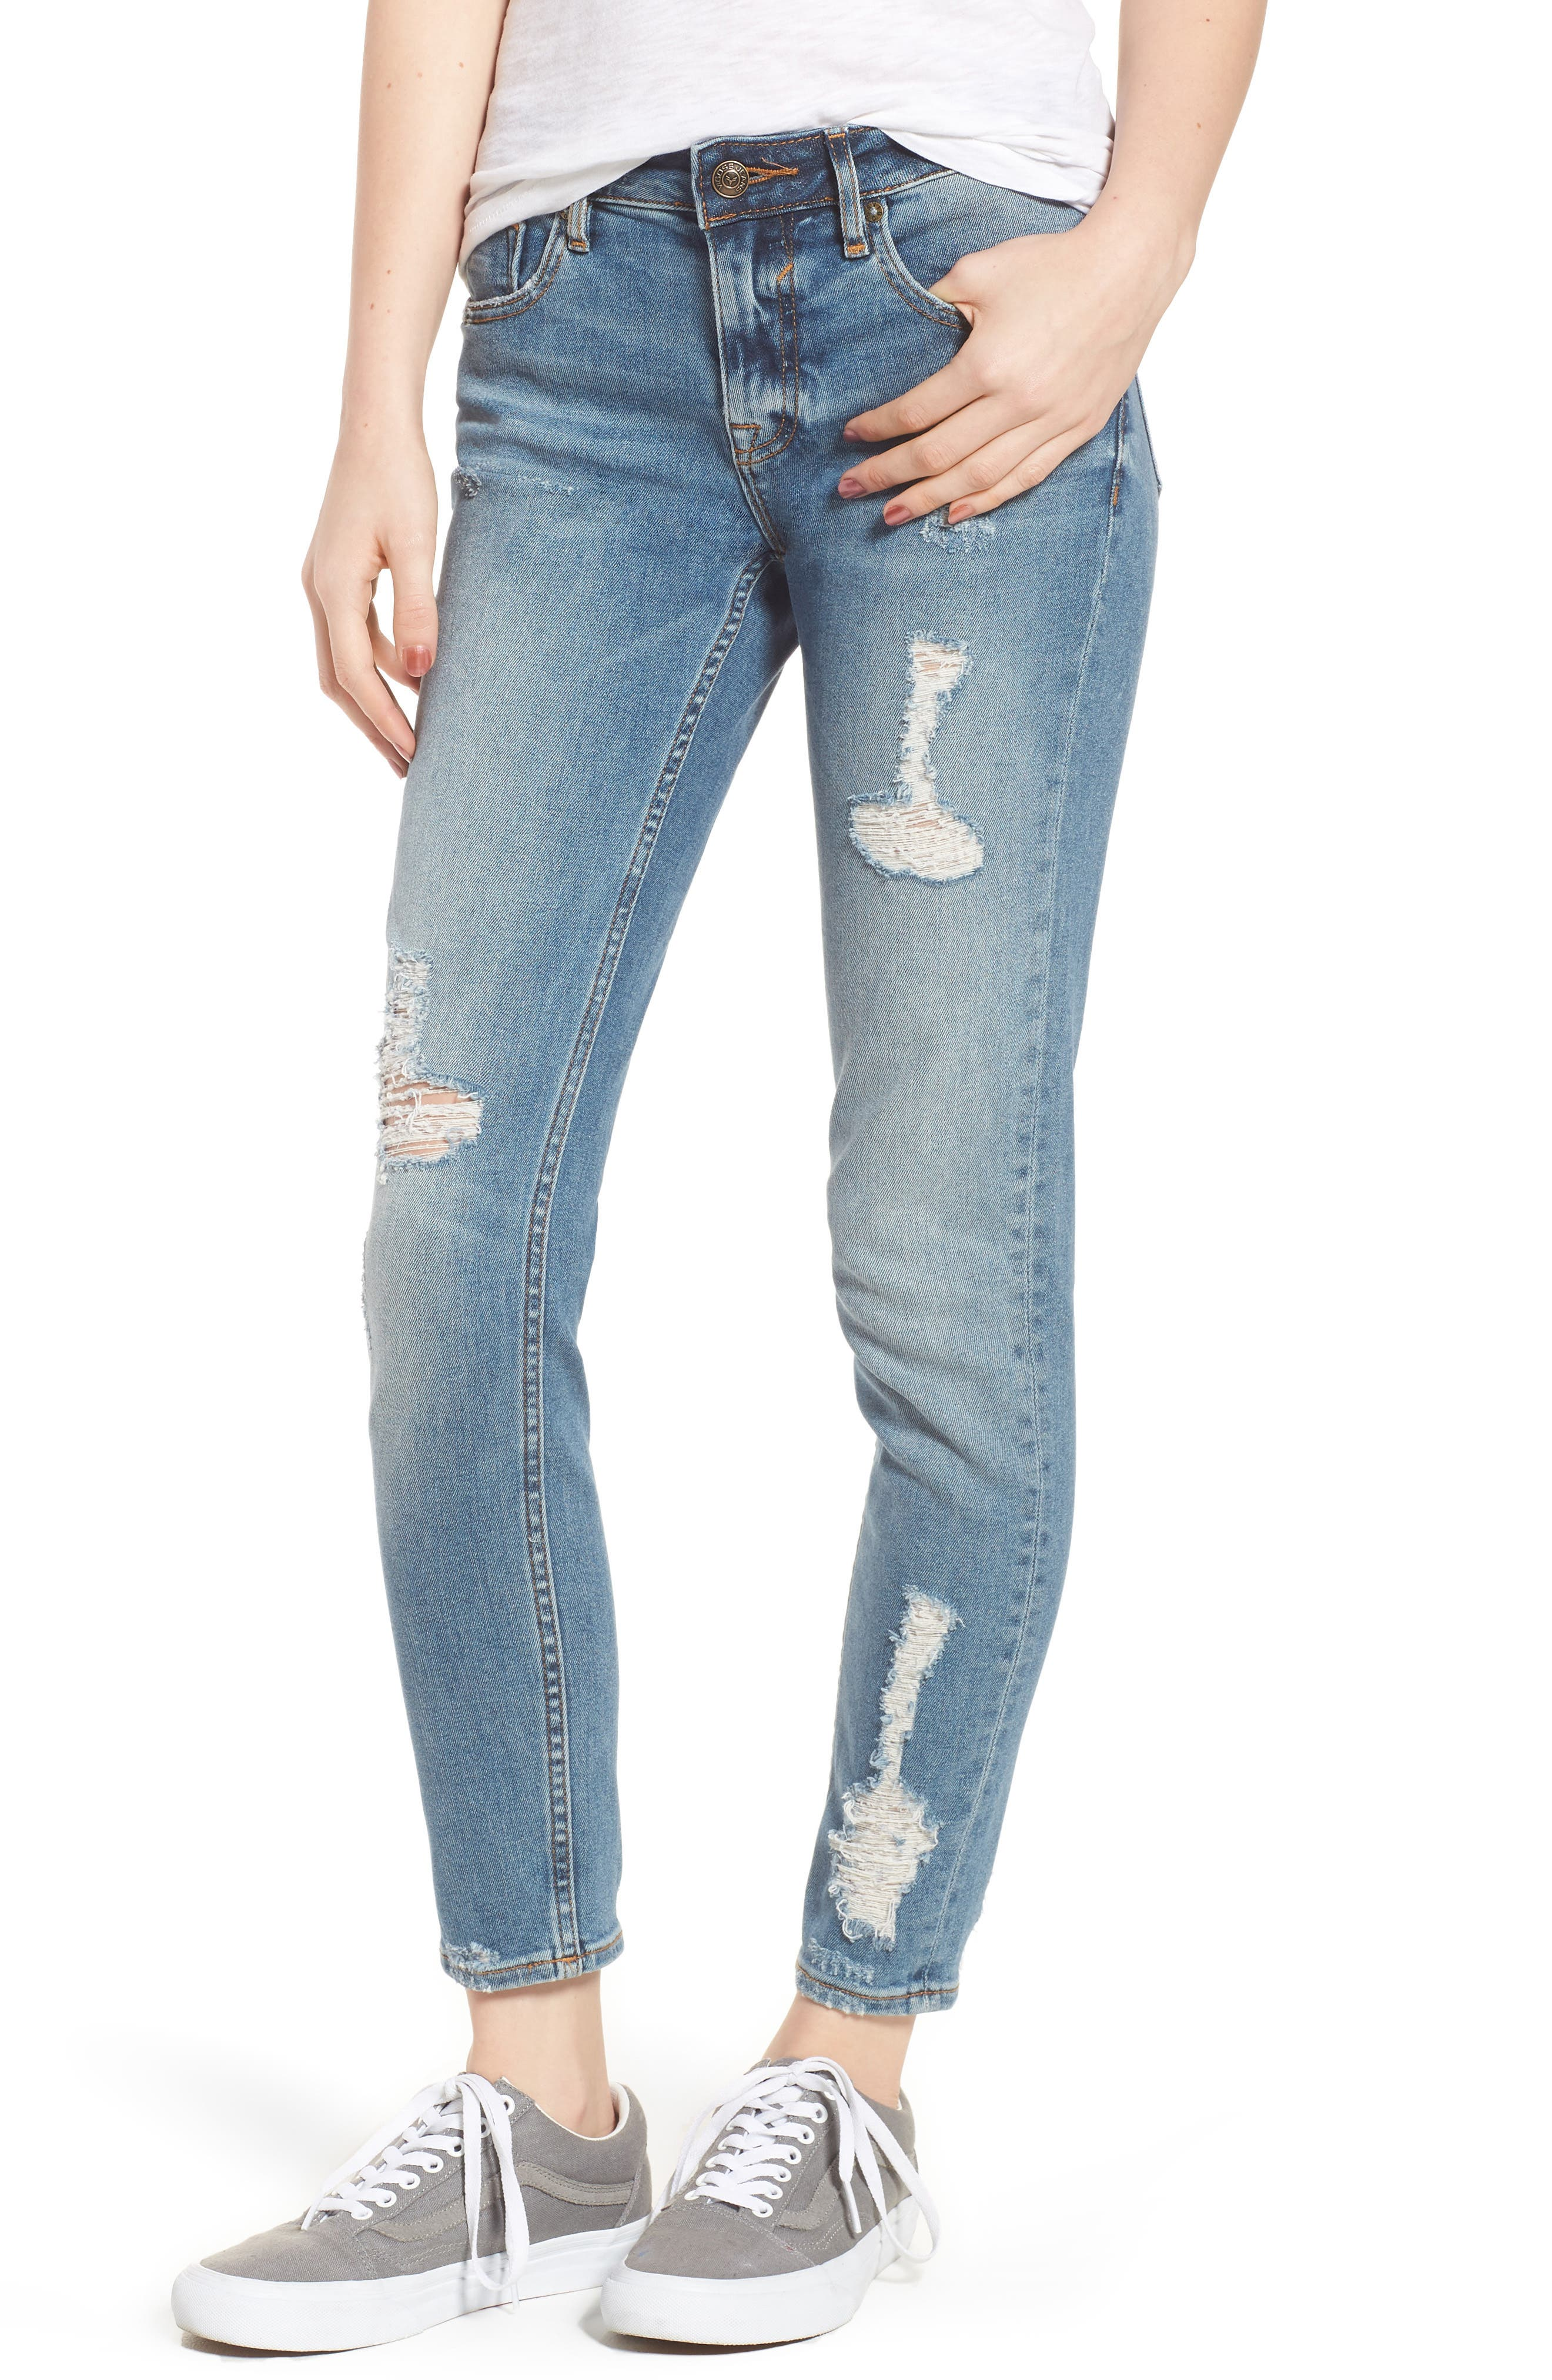 Jagger Decon Distressed Skinny Jeans,                         Main,                         color, Medium Wash